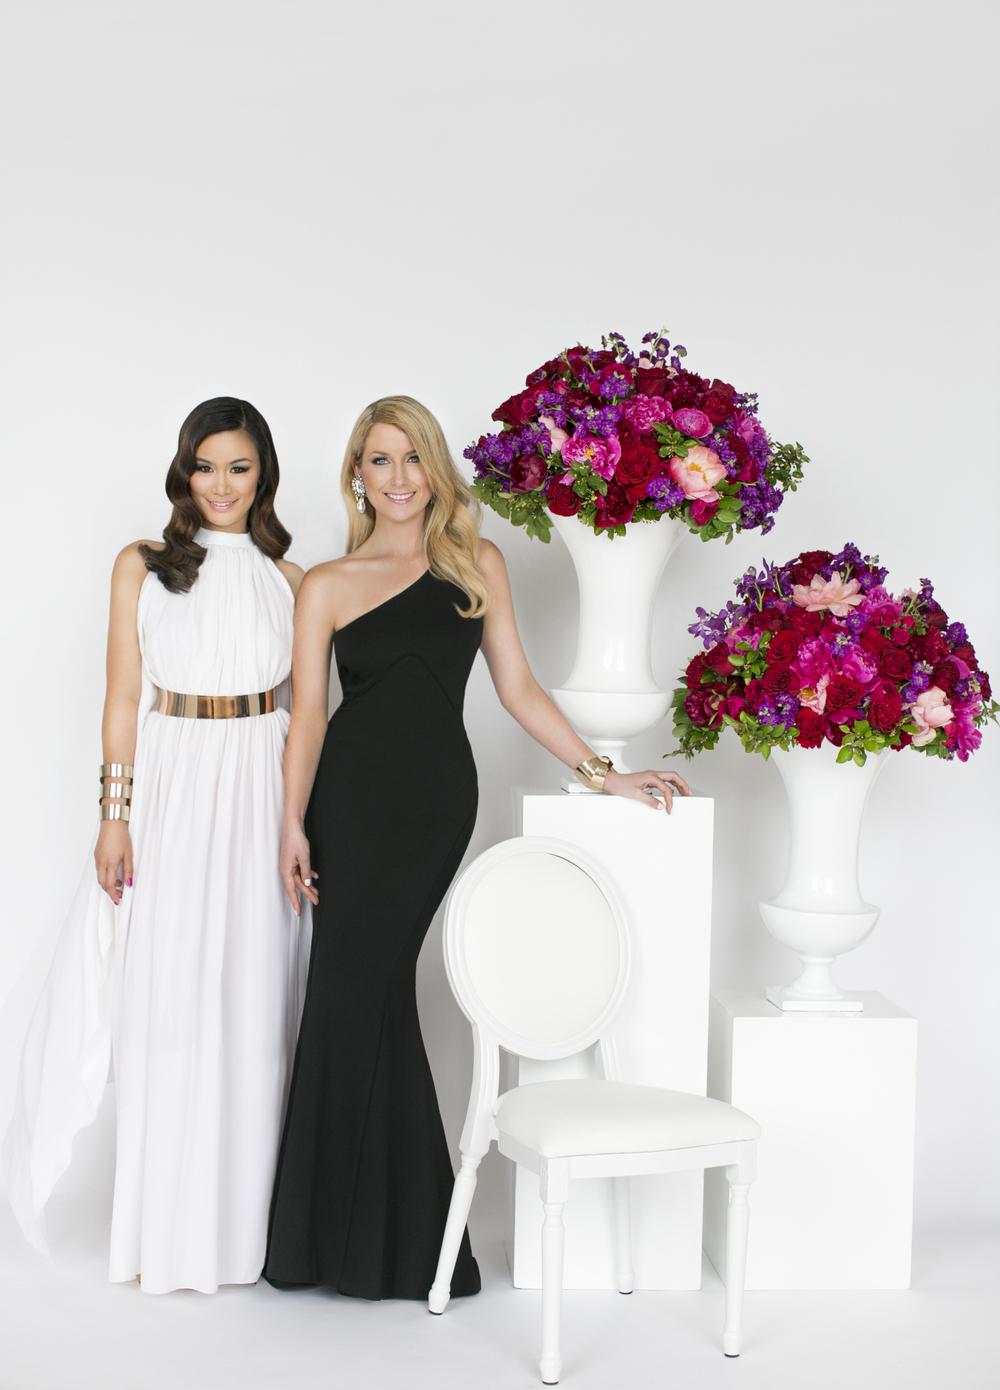 Candice&Alison2014_RenataKaveh_2.jpg